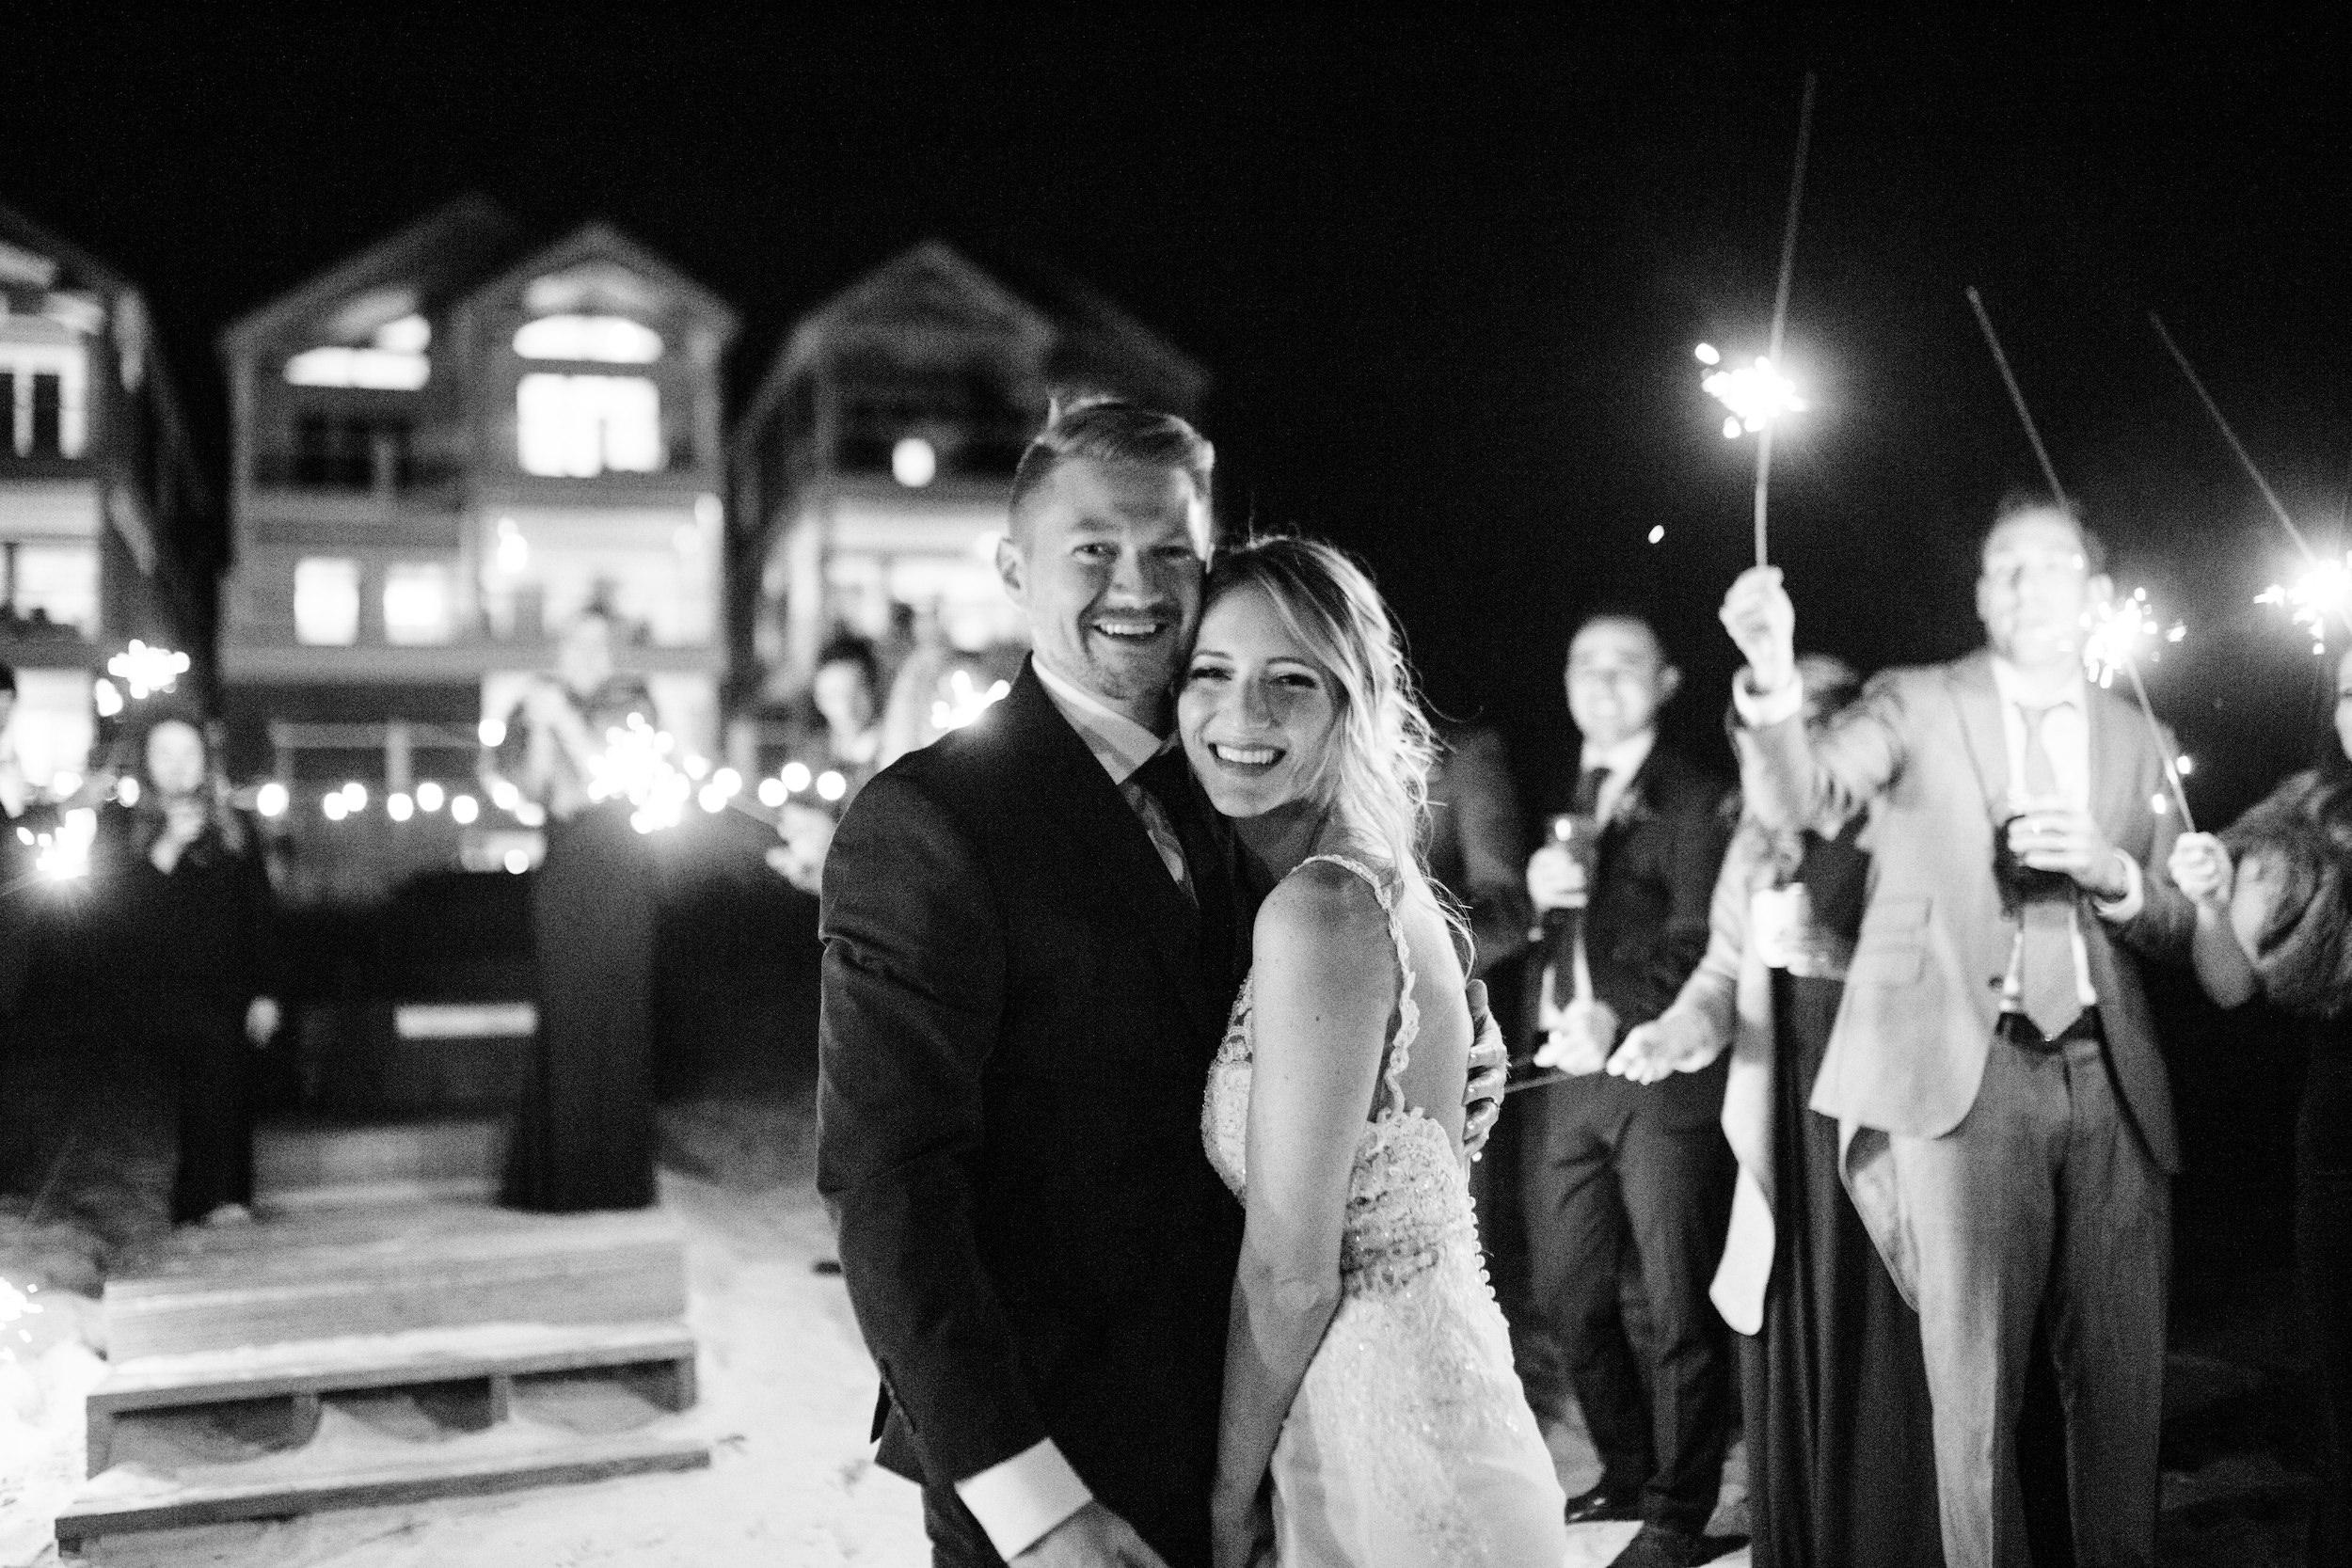 Ricky & Brittney - Reception - Jake & Katie Photography_459.jpg